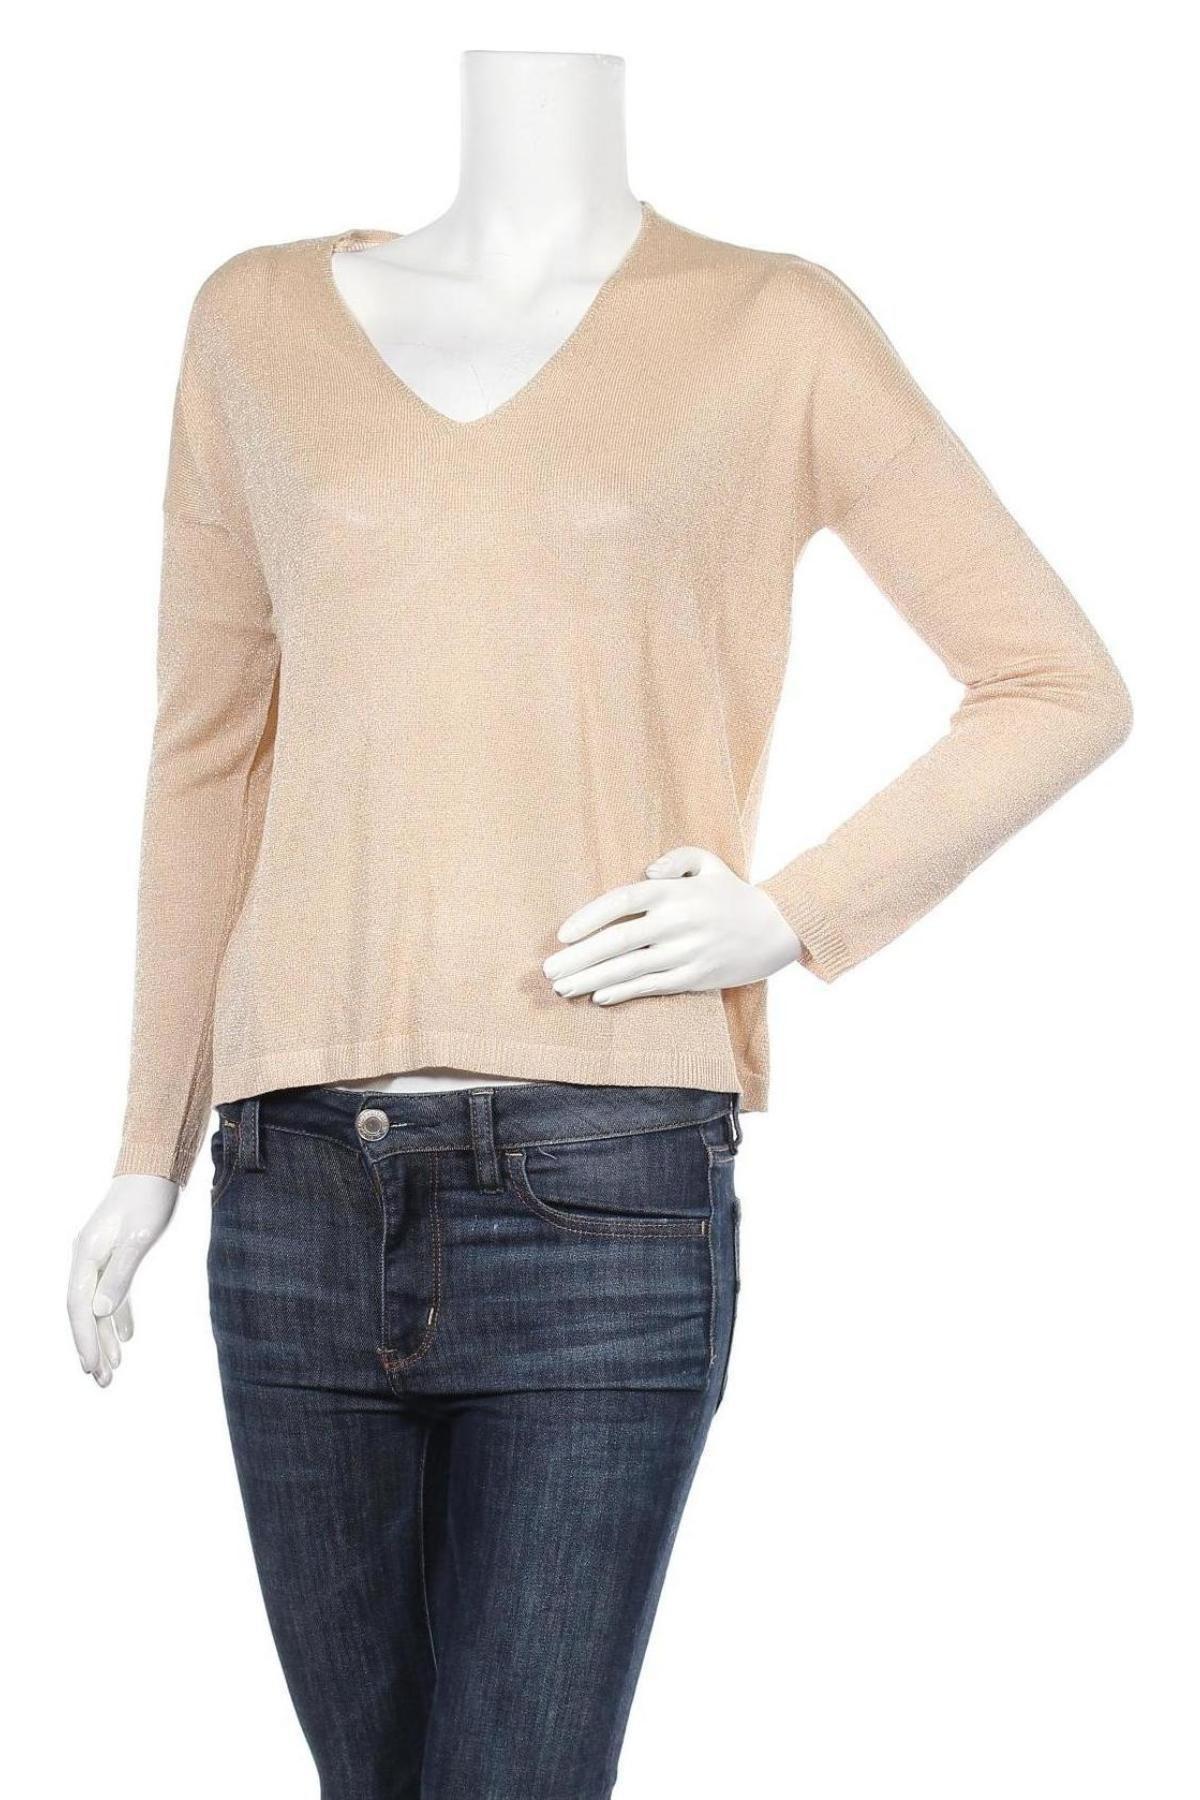 Дамски пуловер ONLY, Размер XS, Цвят Бежов, 80% вискоза, 20% метални нишки, Цена 39,00лв.